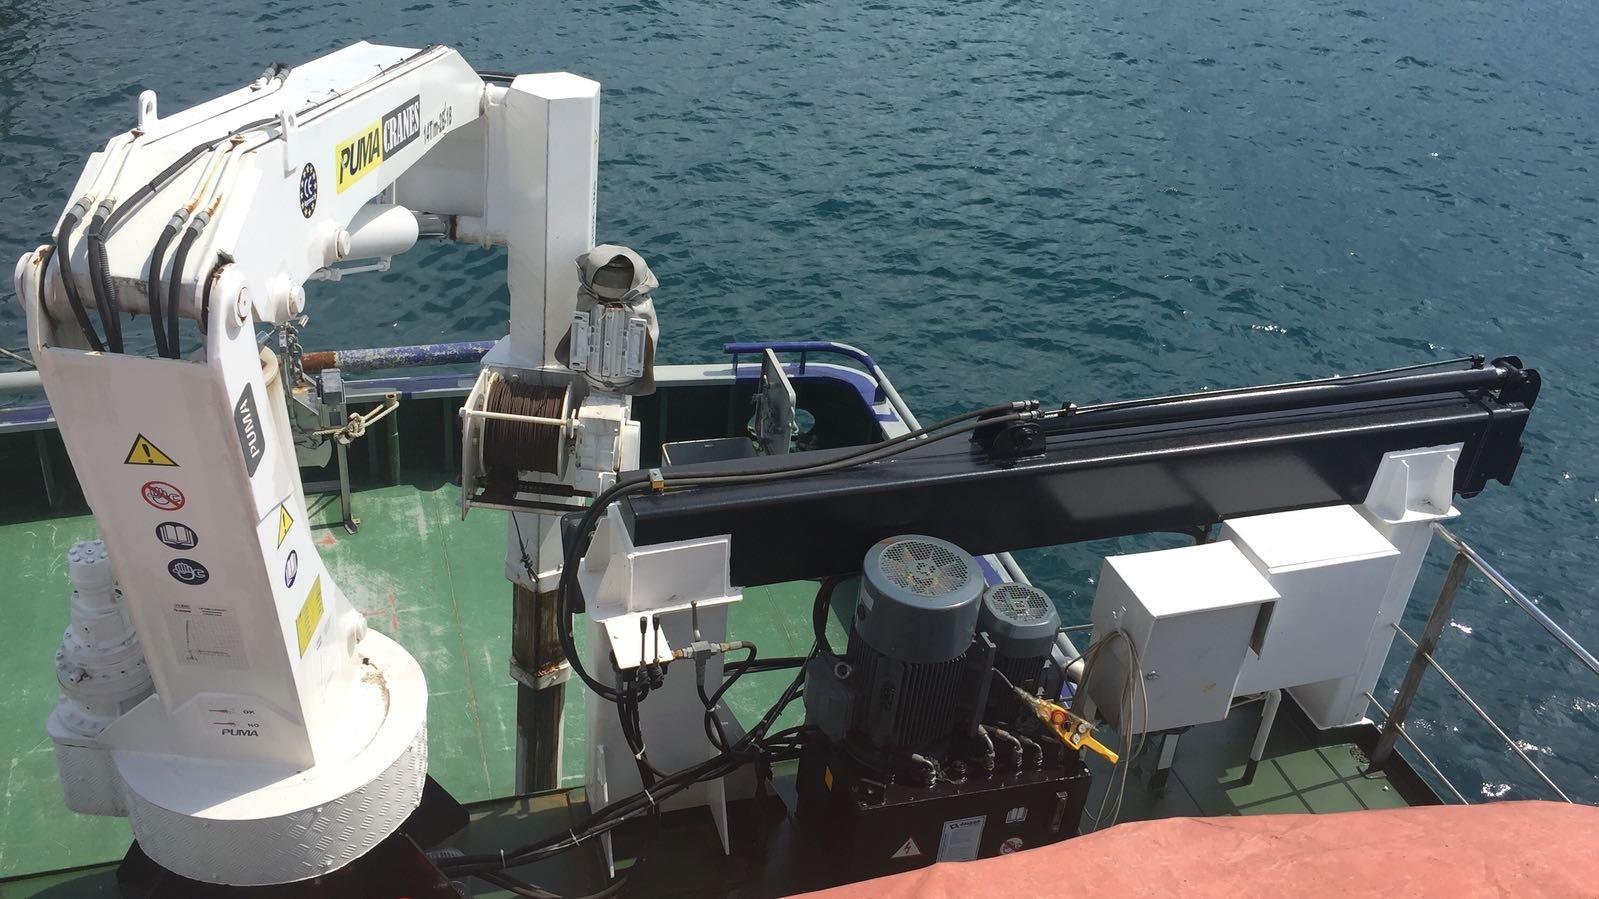 puma-marine-crane503462.jpg